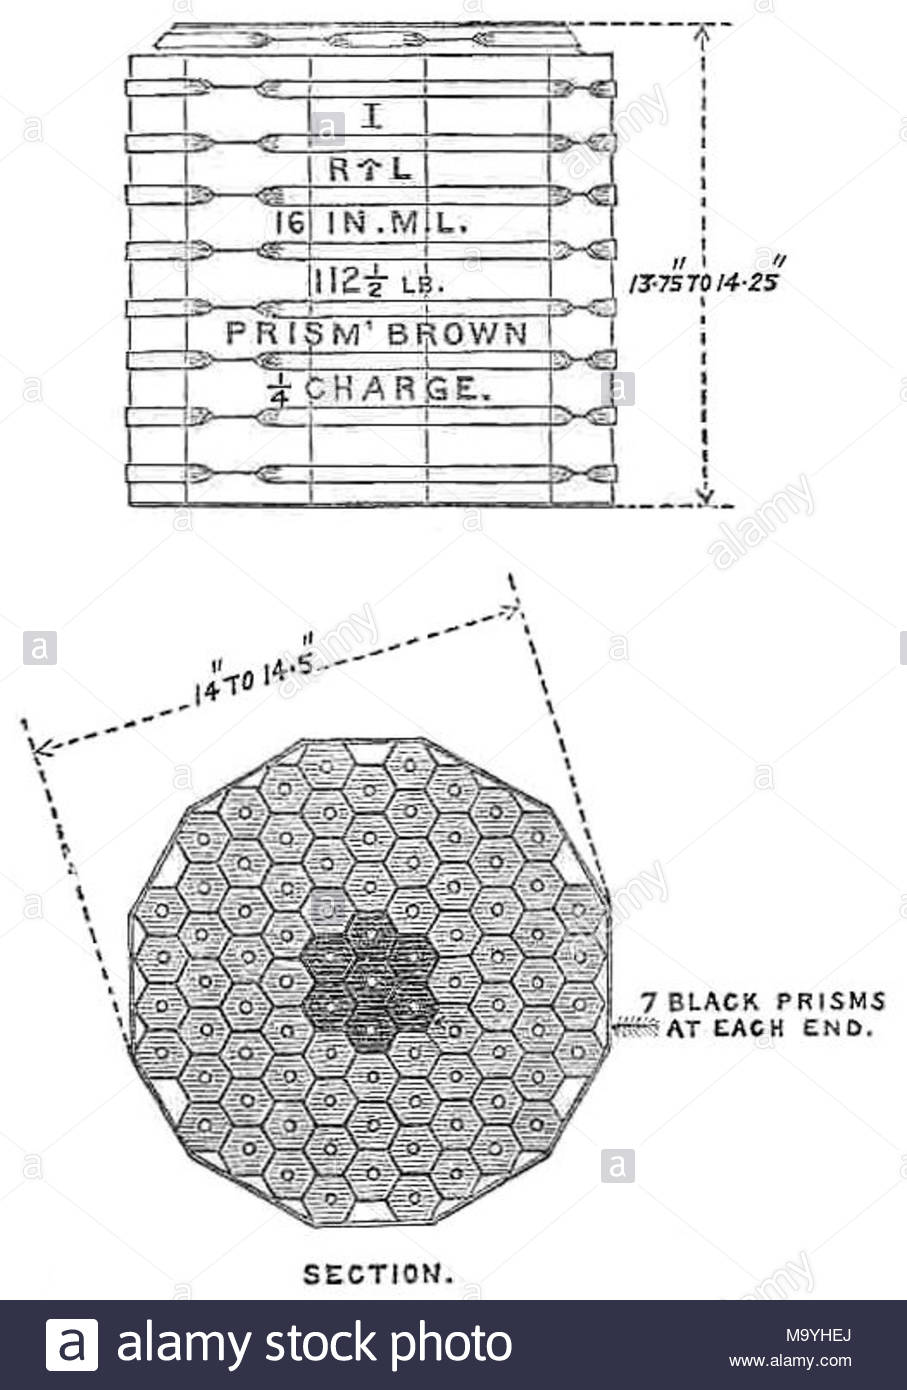 80 Ton Stock Photos Images Alamy Potato Gun Diagram Of 1125 Lb Charge Prism Brown Powder Cartridge For British Rml 16